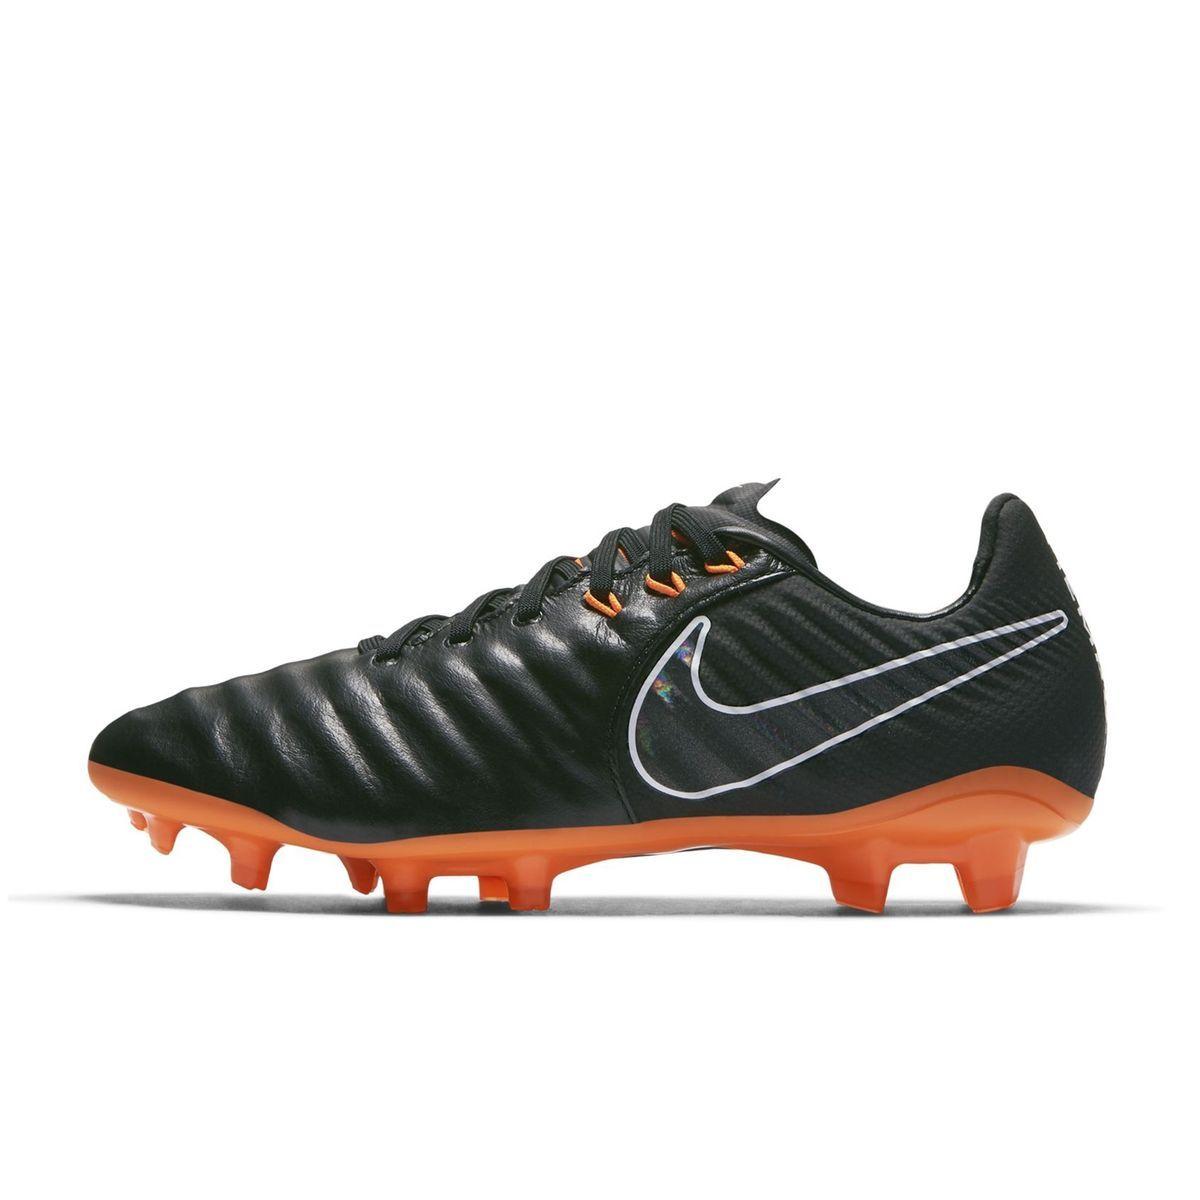 Chaussures Football Chaussure De Football Nike Tiempo Legend